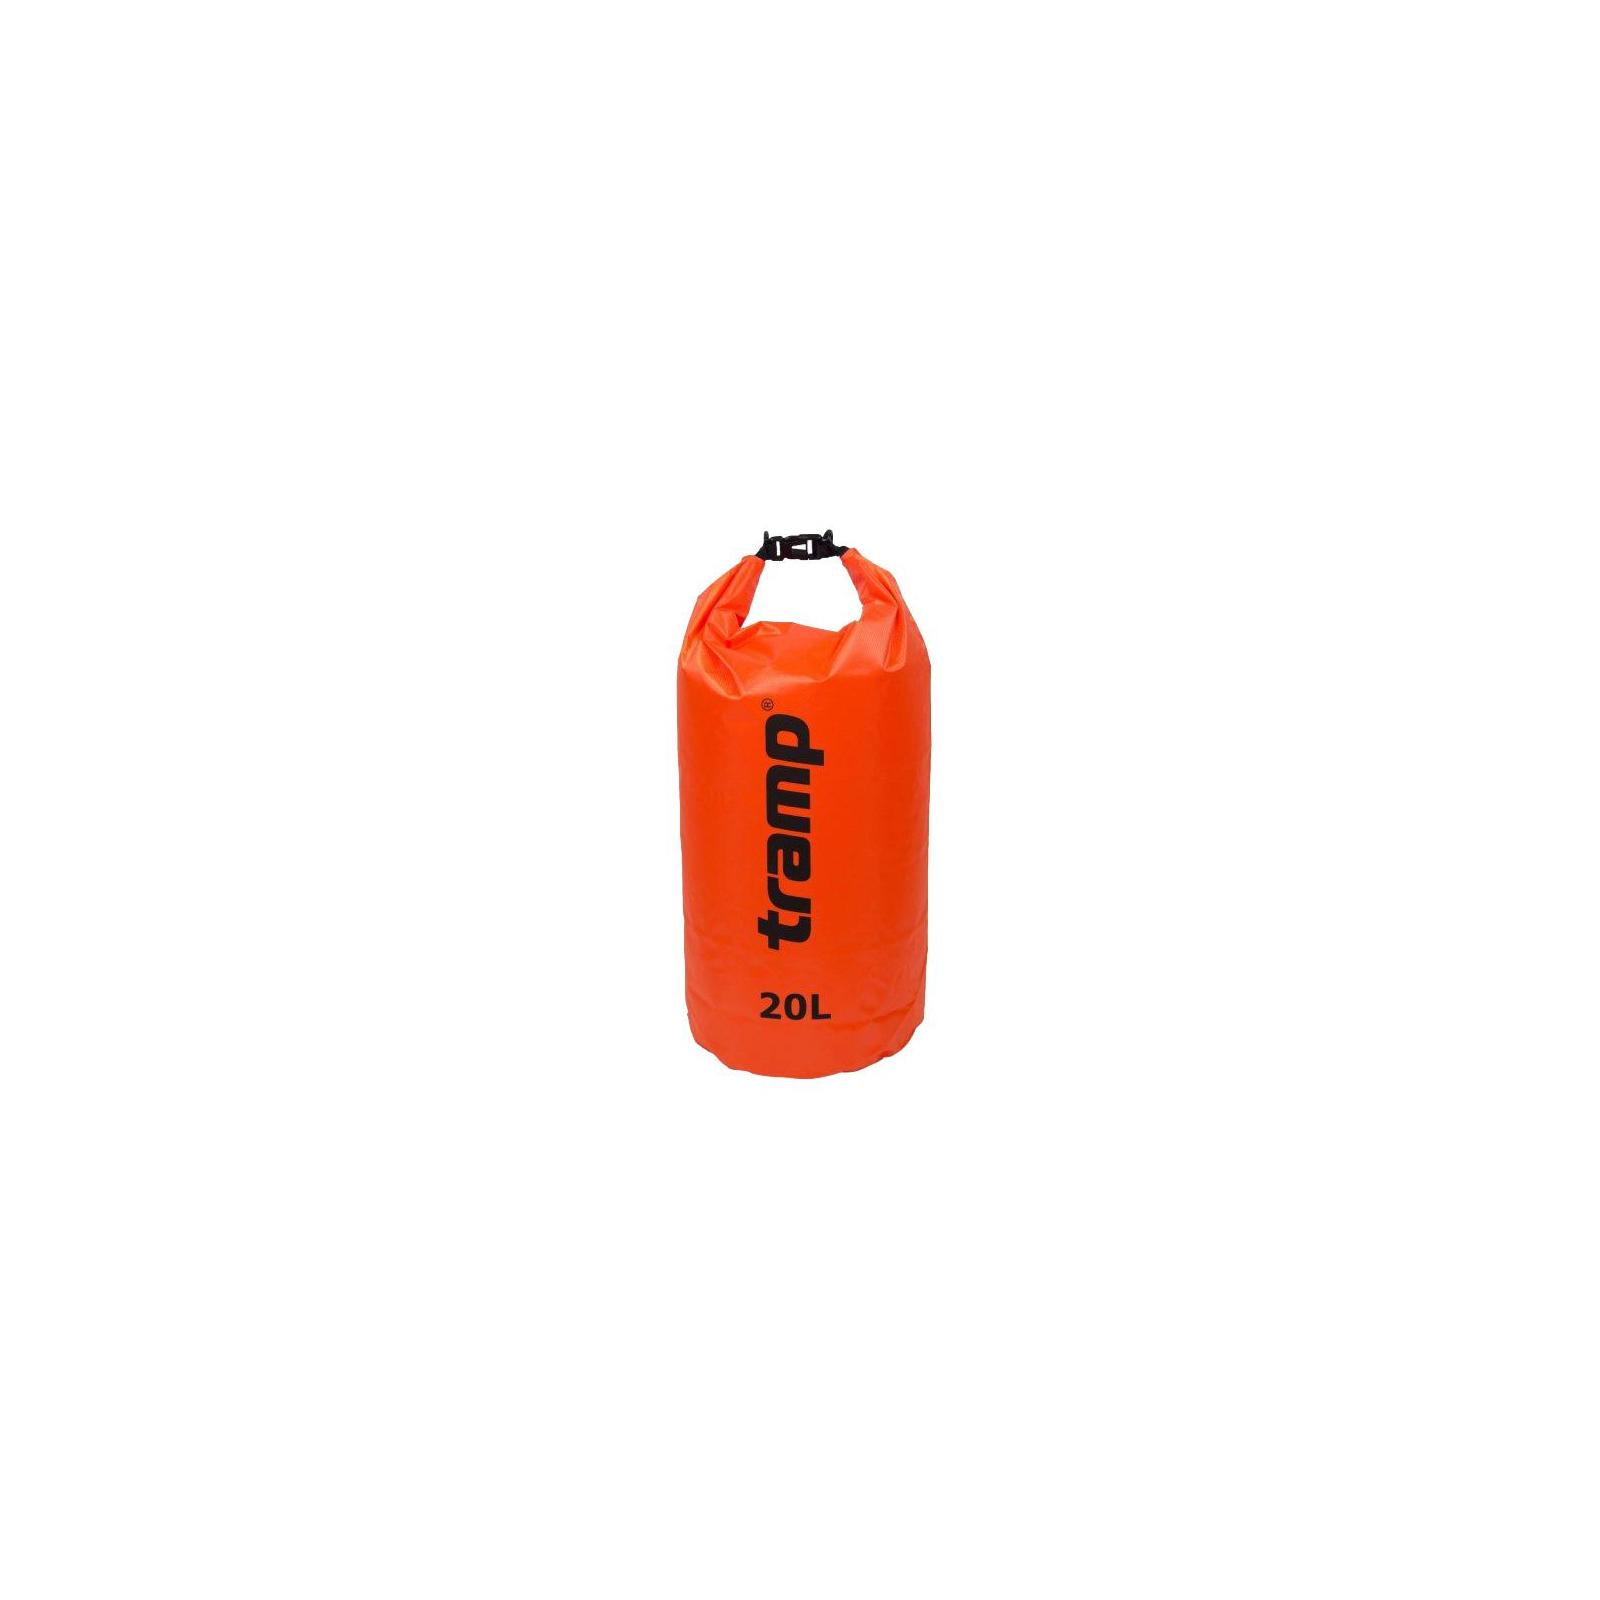 Гермомешок Tramp PVC Diamond Rip-Stop оранжевый 20л (TRA-113-orange)